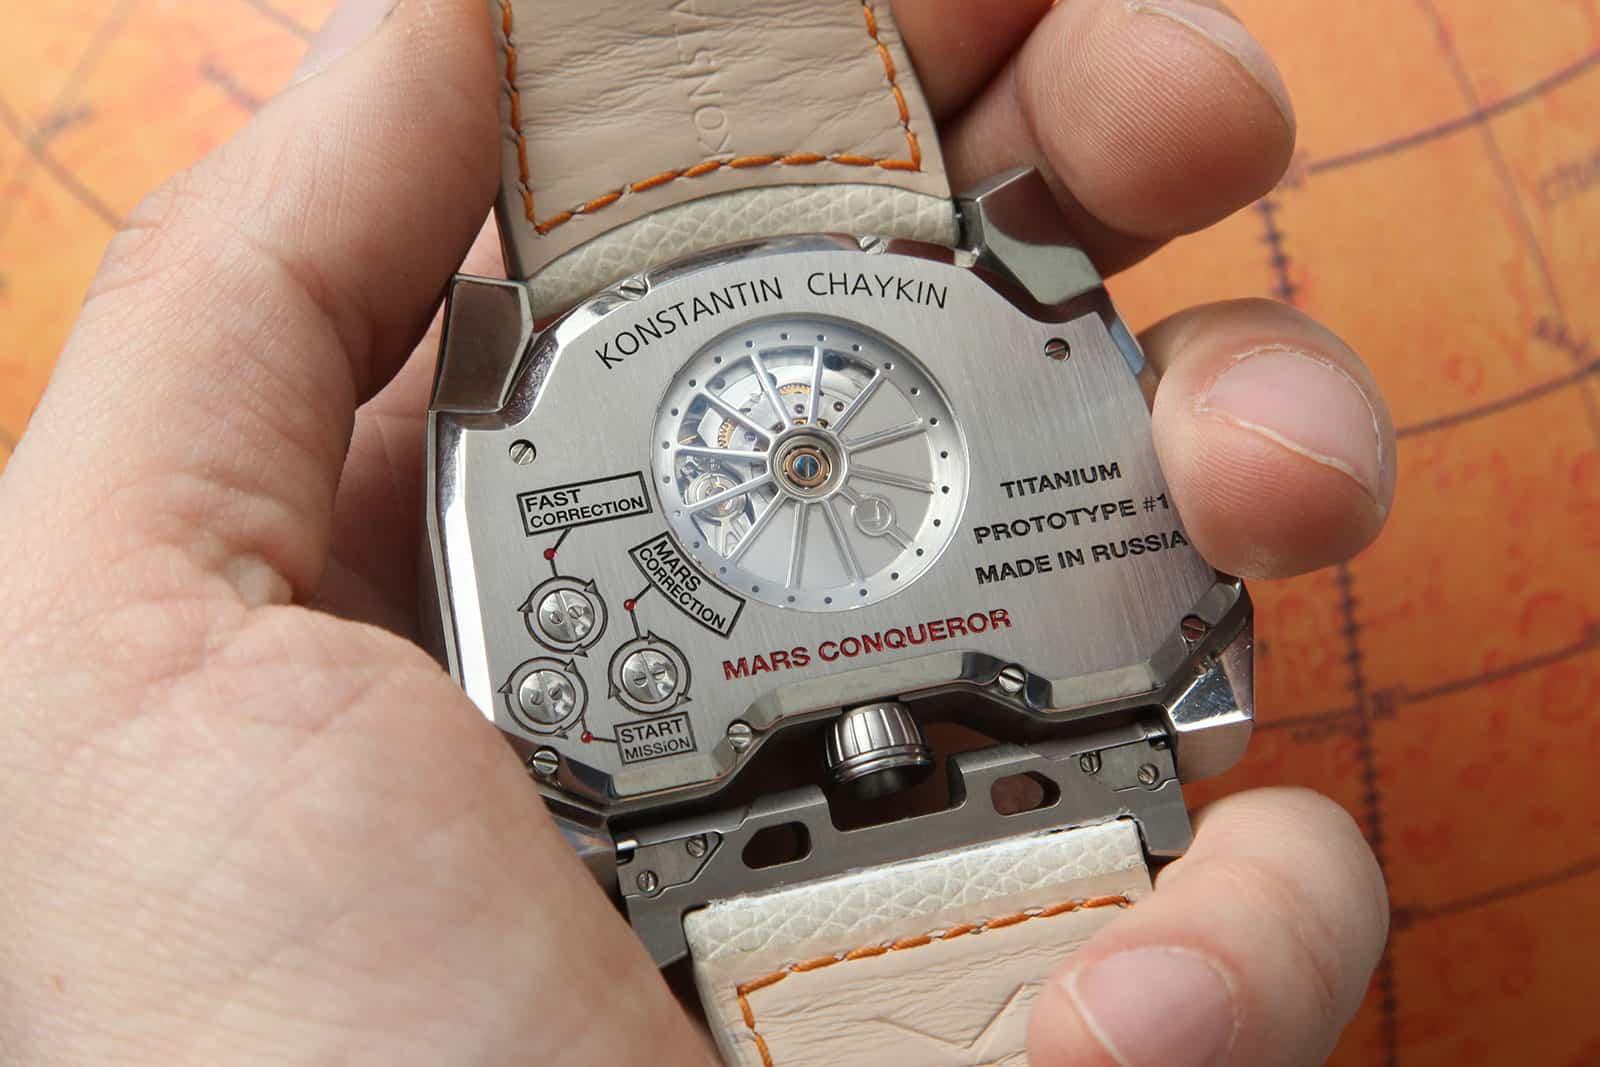 Konstantin Chaykin Mars Conqueror watch 6